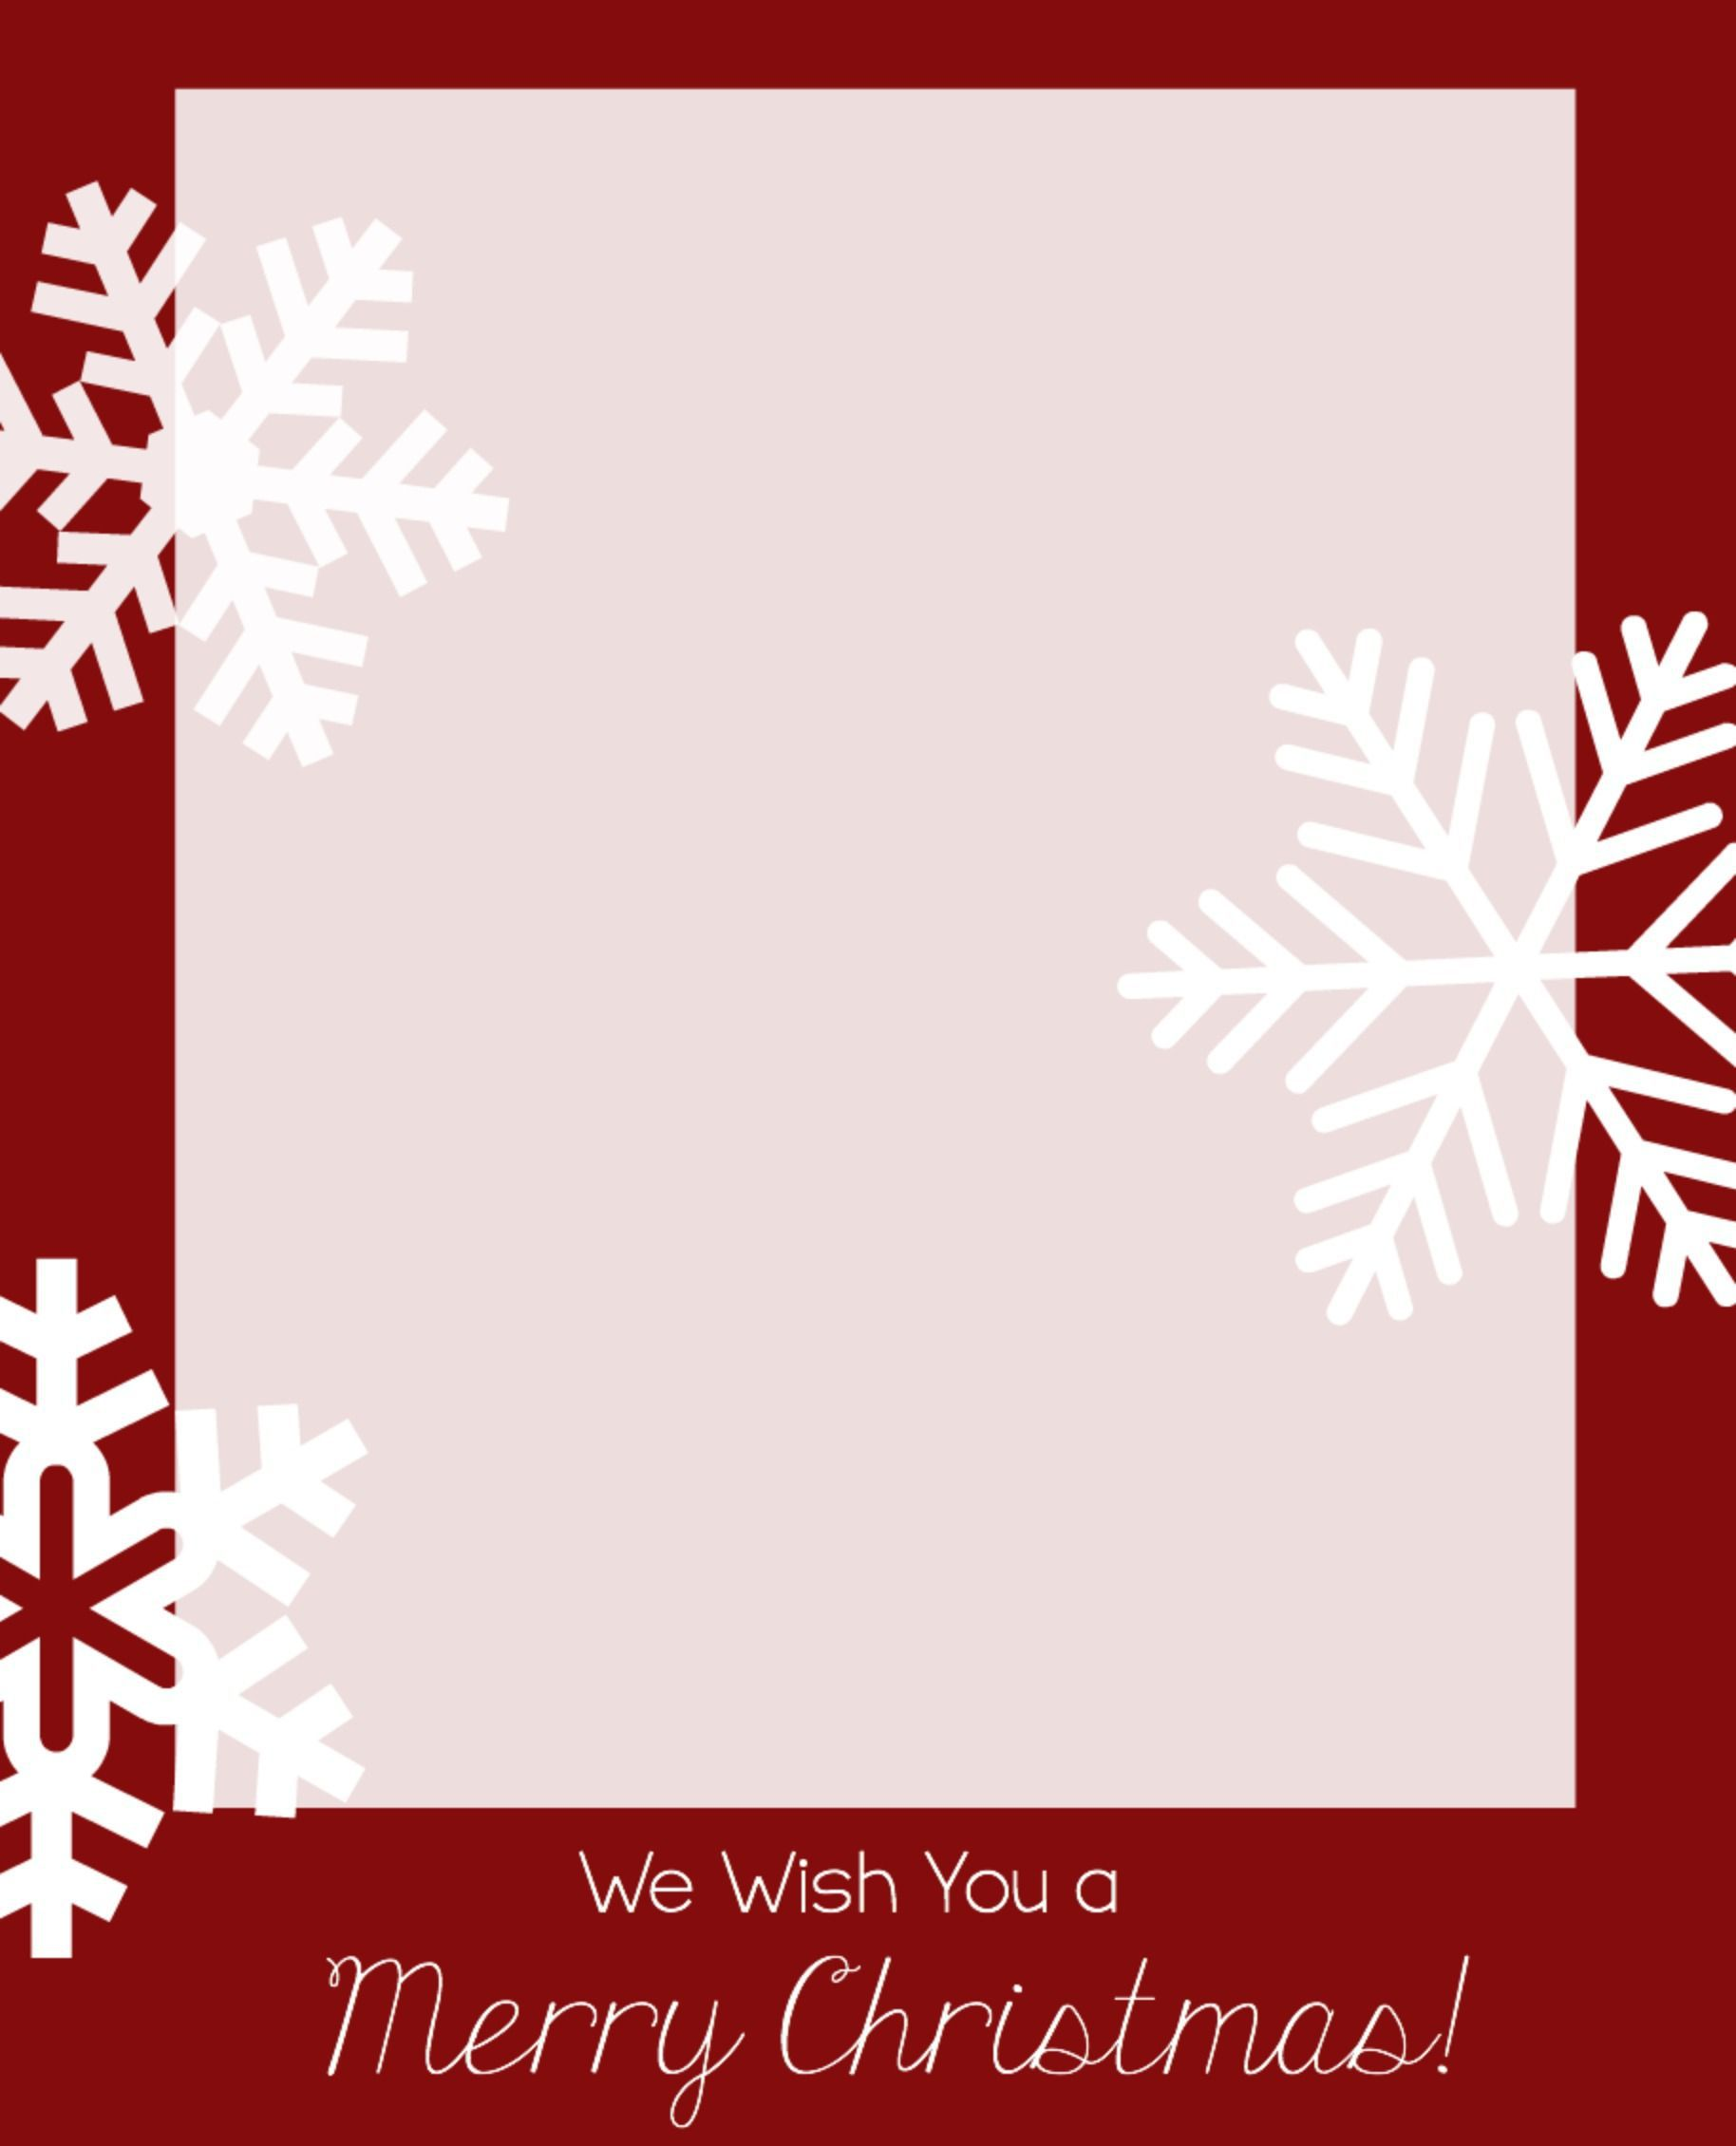 000 Fantastic Free Printable Holiday Card Template Idea  Templates Christma Tent Recipe Gift HolderFull